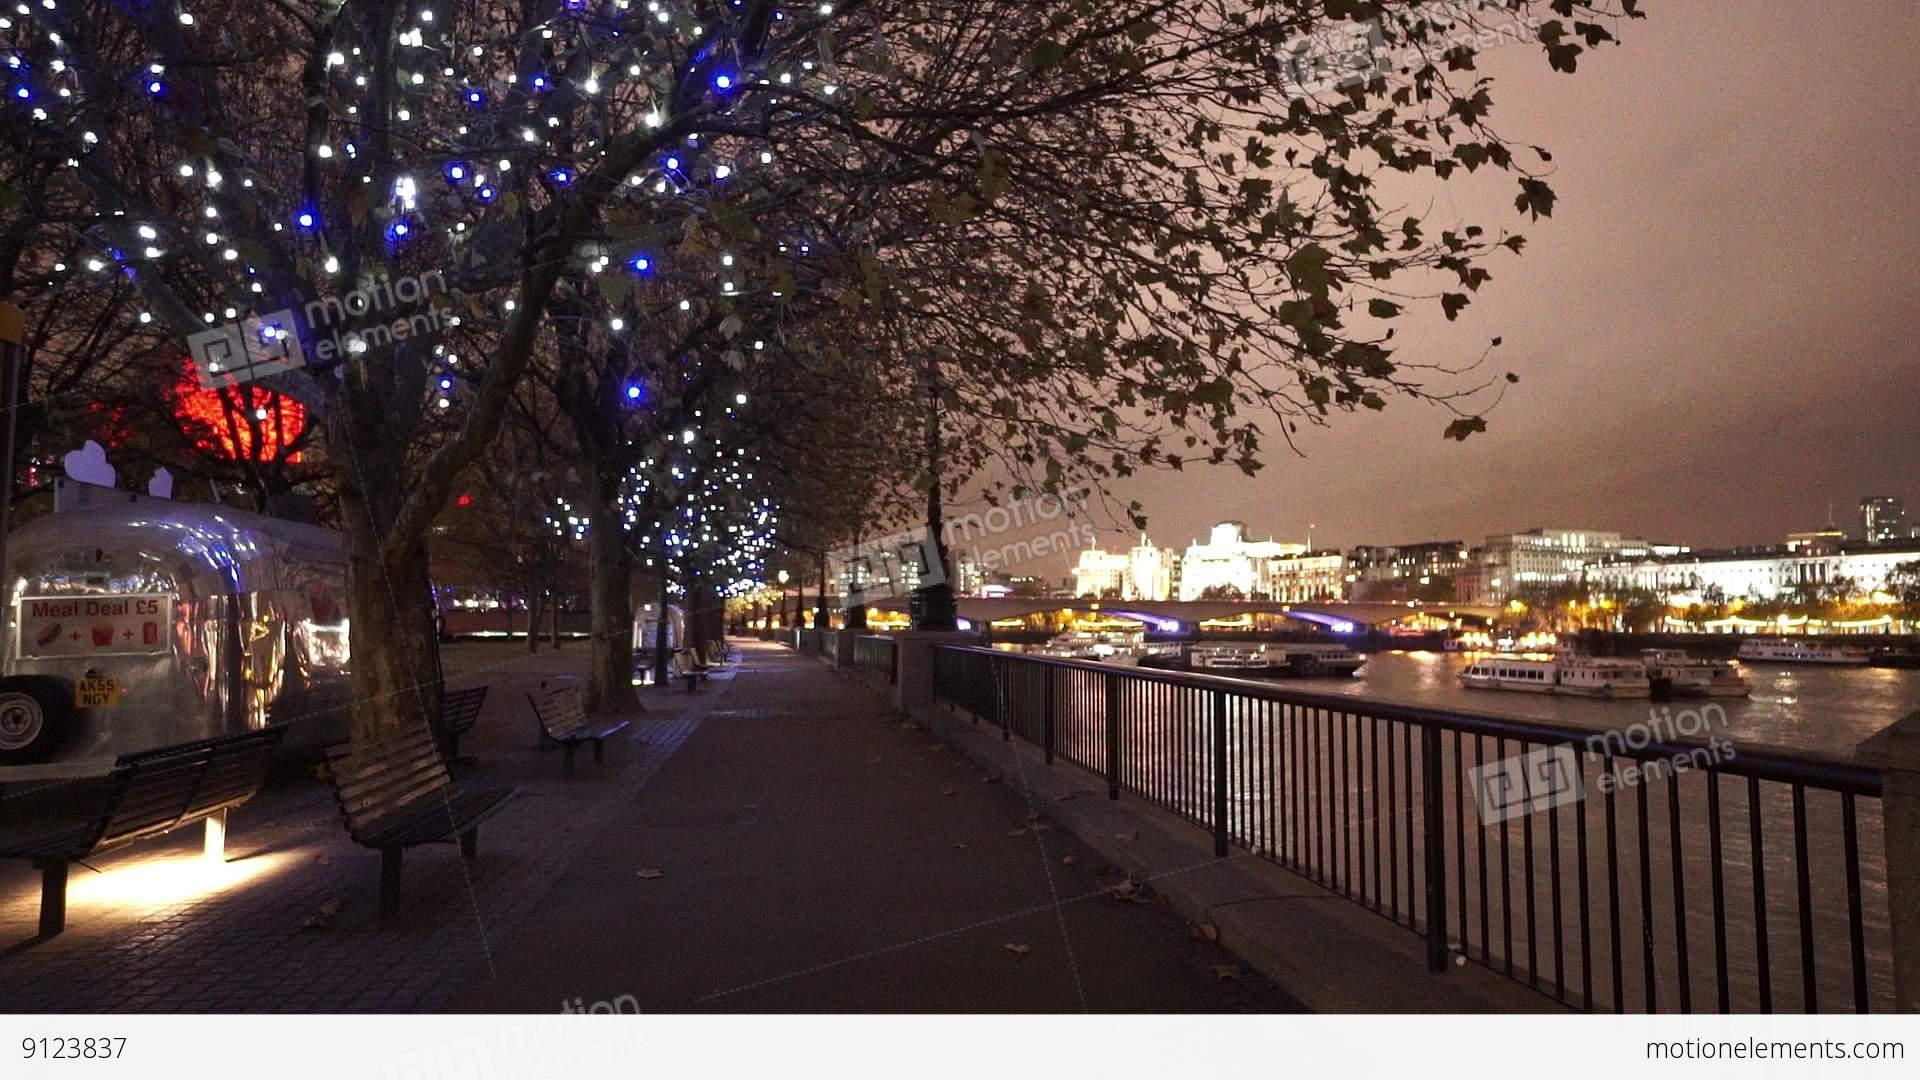 Night lights queens walk london - London South Bank By Night The Queens Walk By Night Stock Video